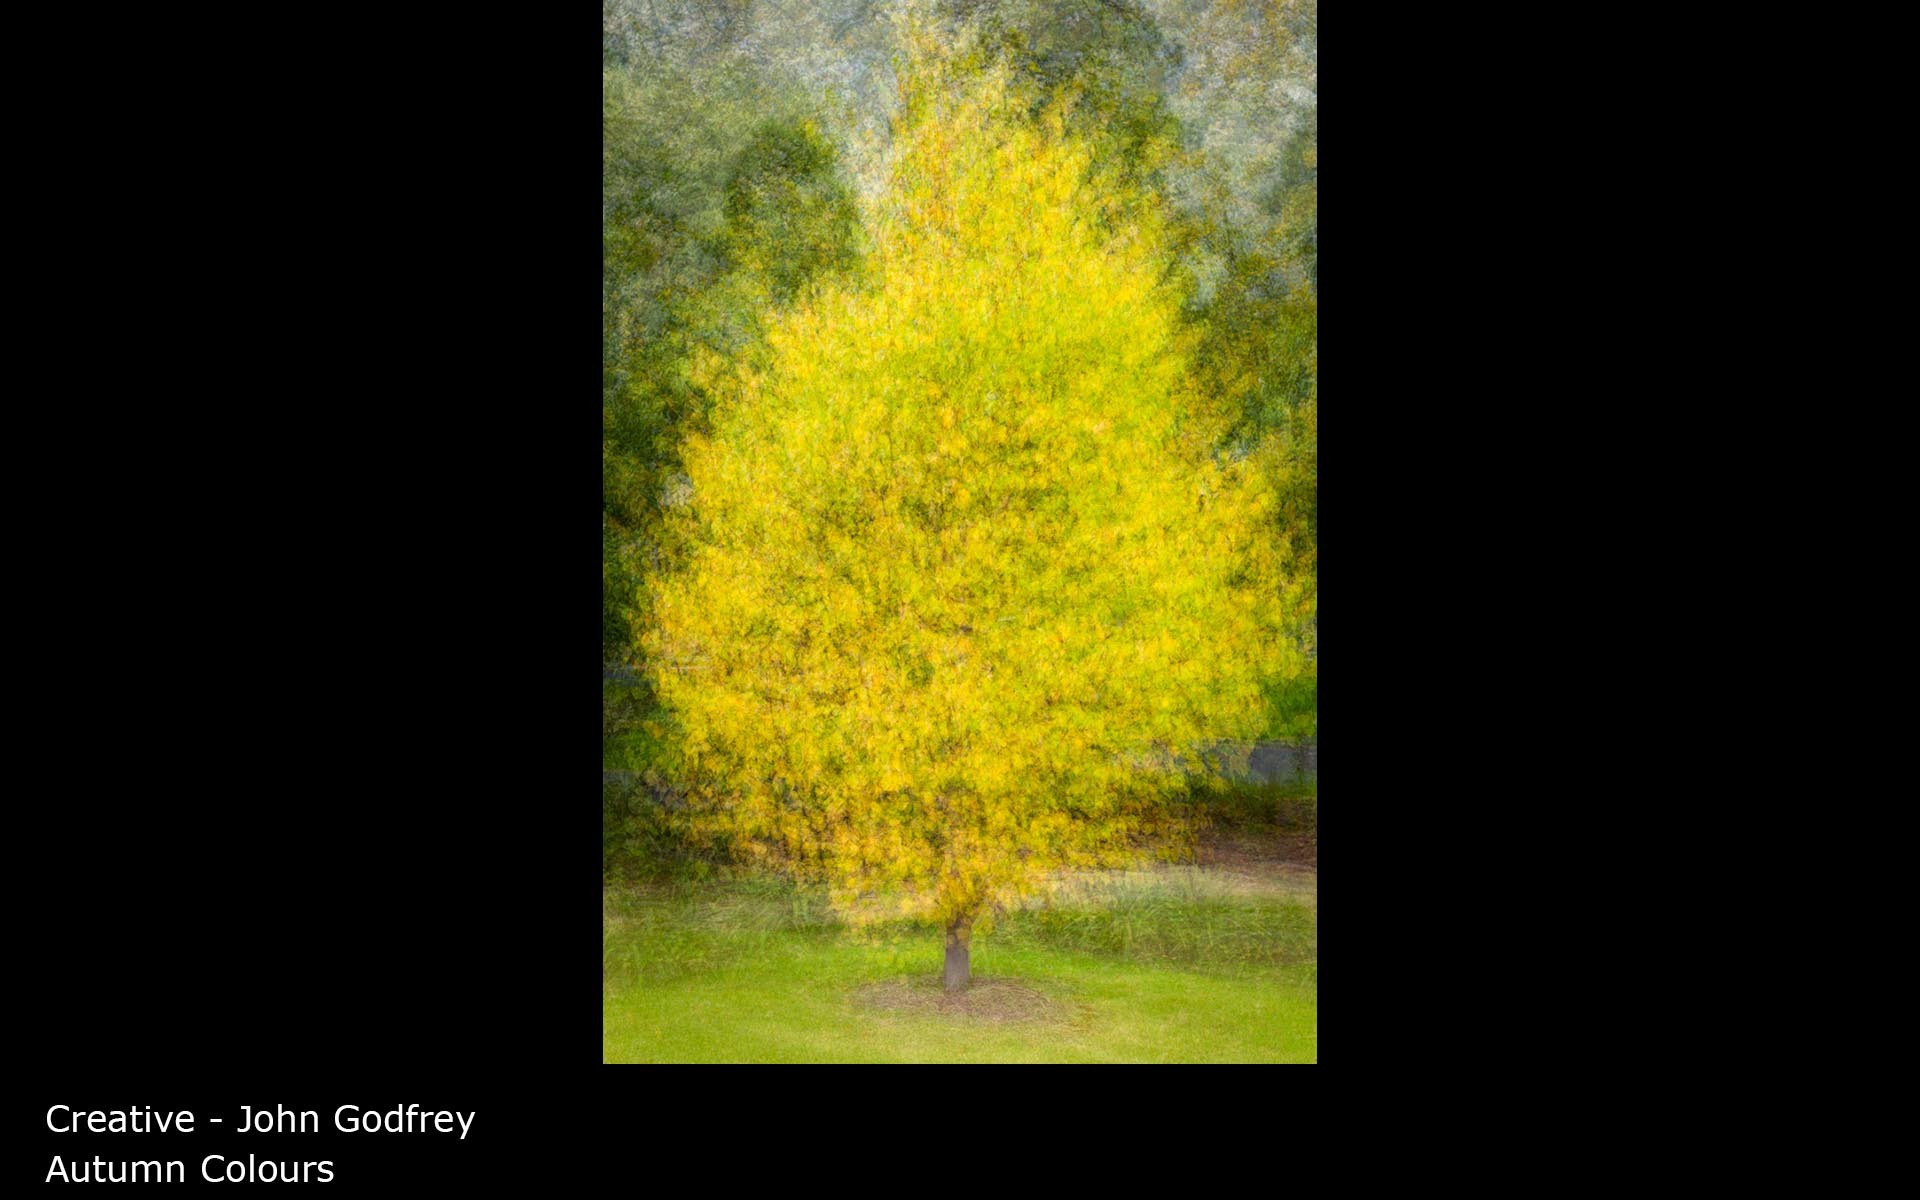 Autumn Colours - John Godfrey